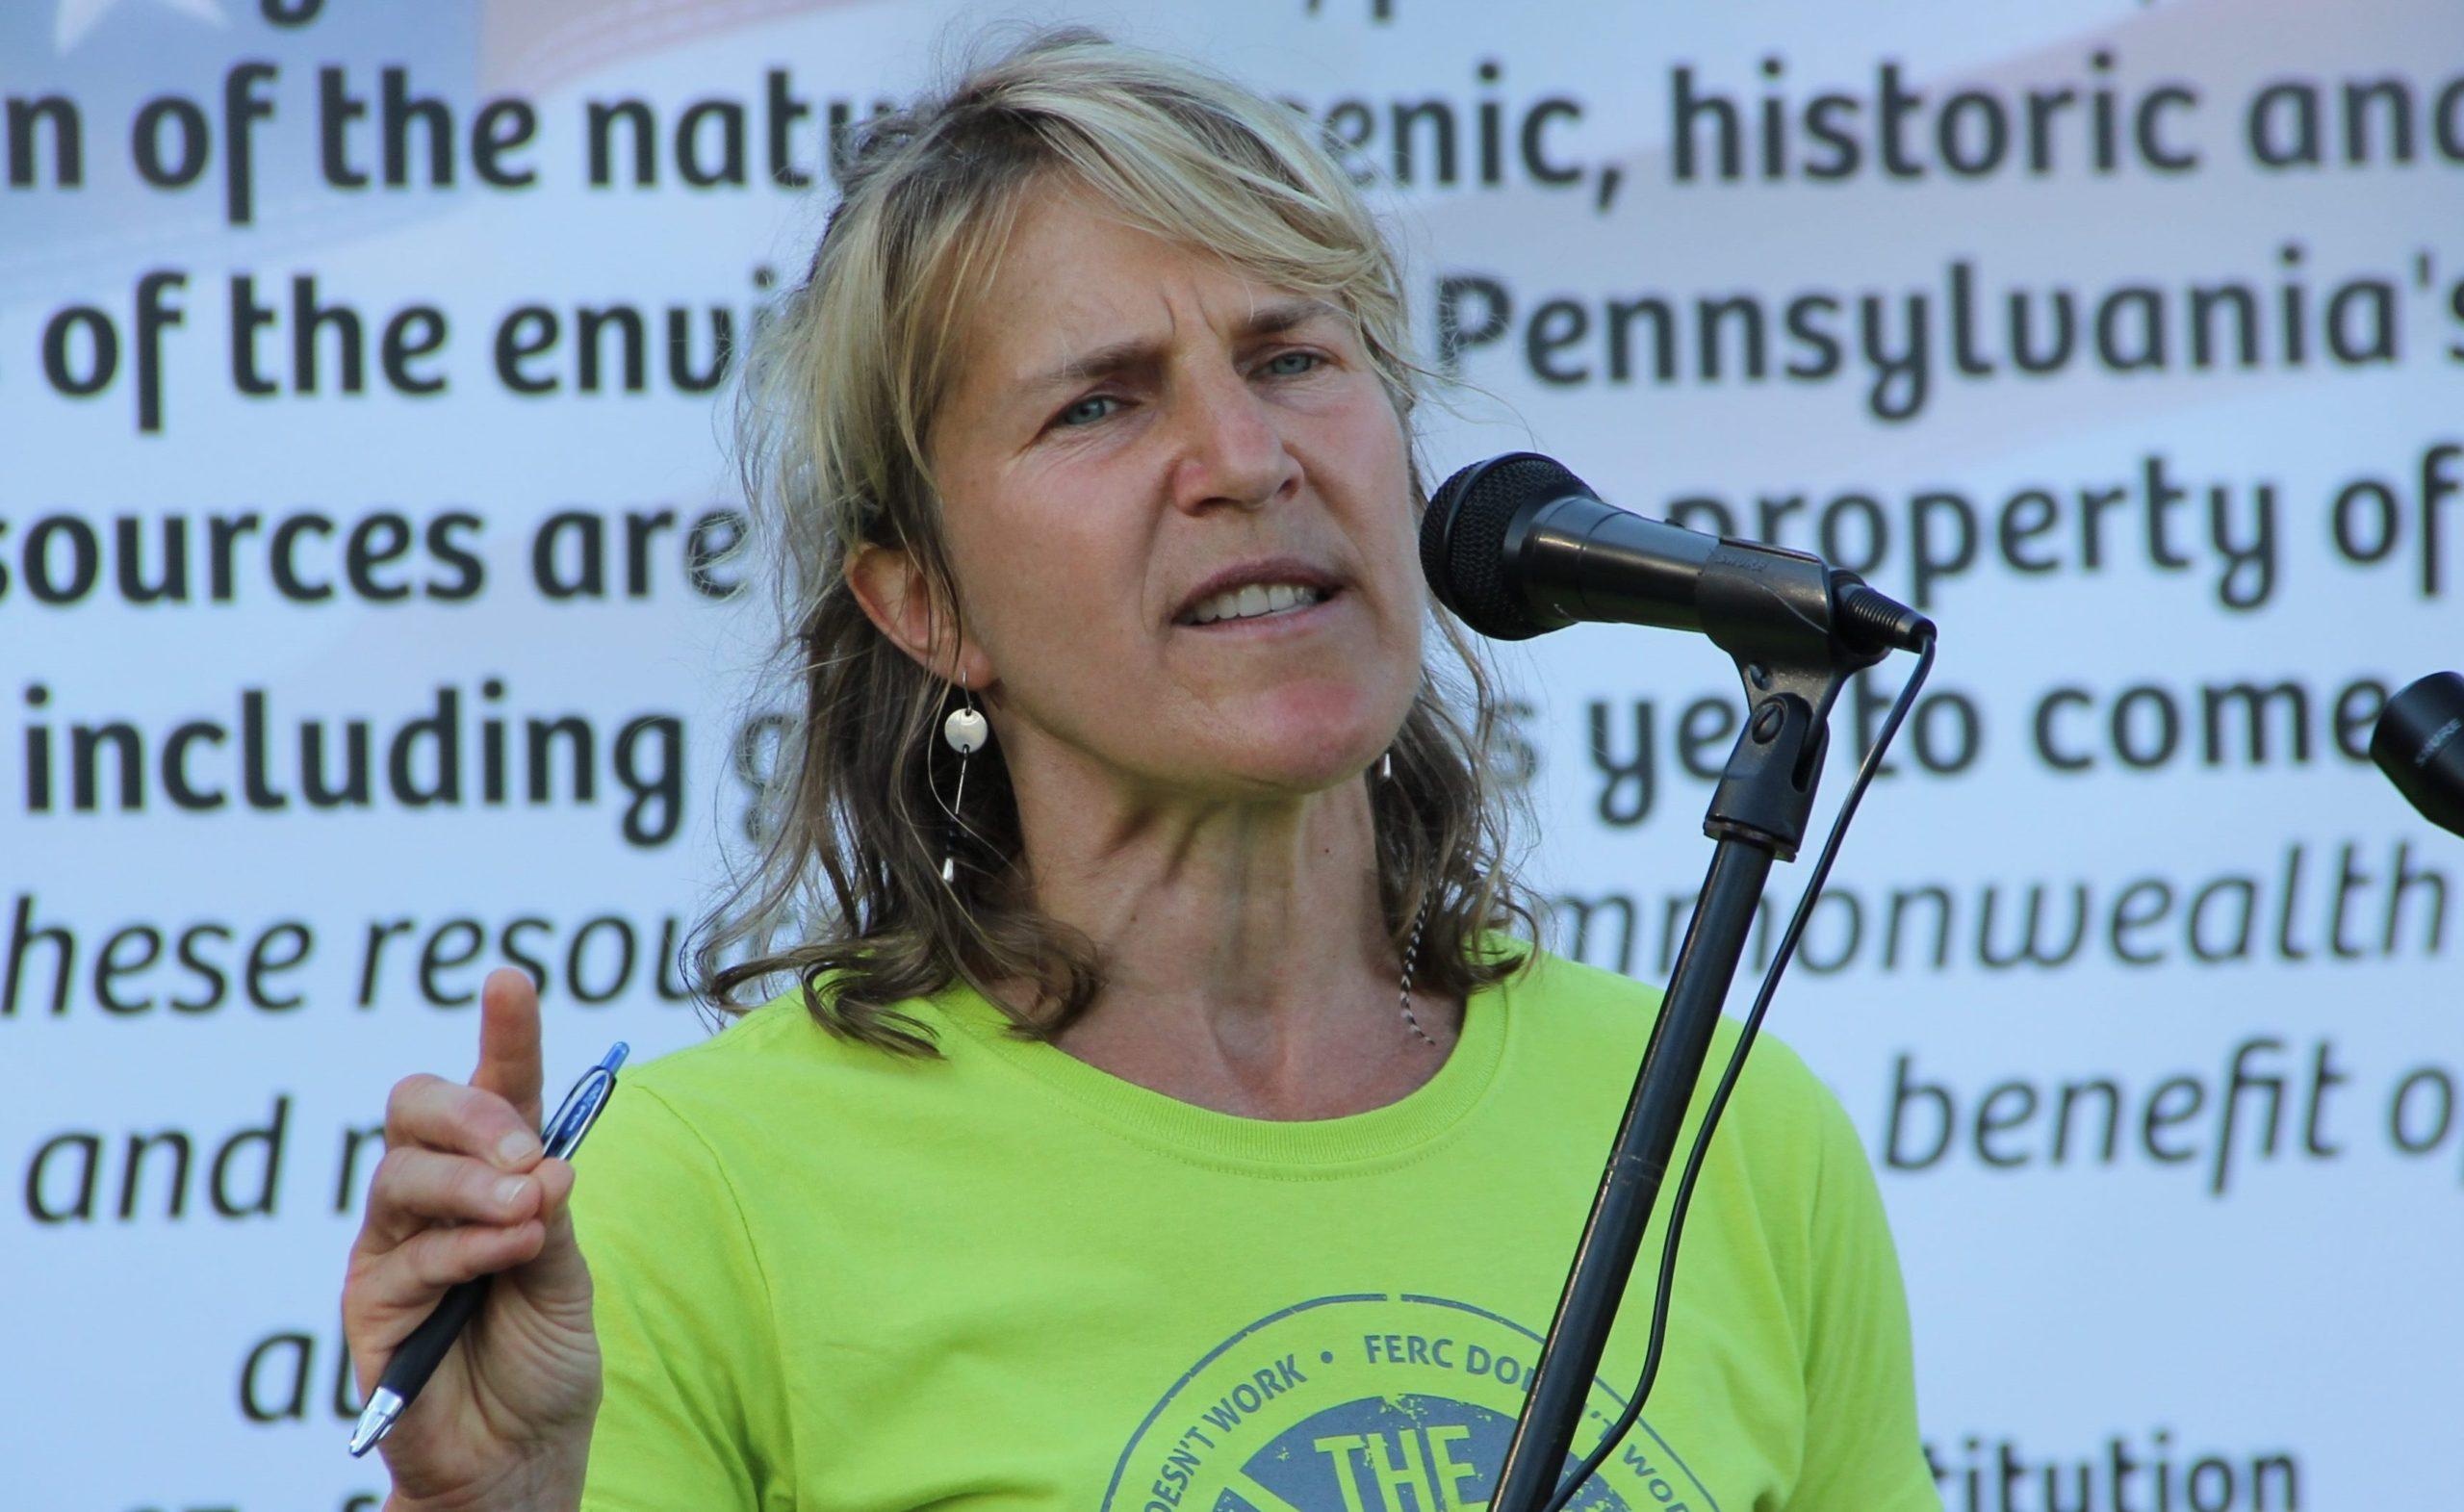 Environmental Rights Attorney: Pass the Green Amendment